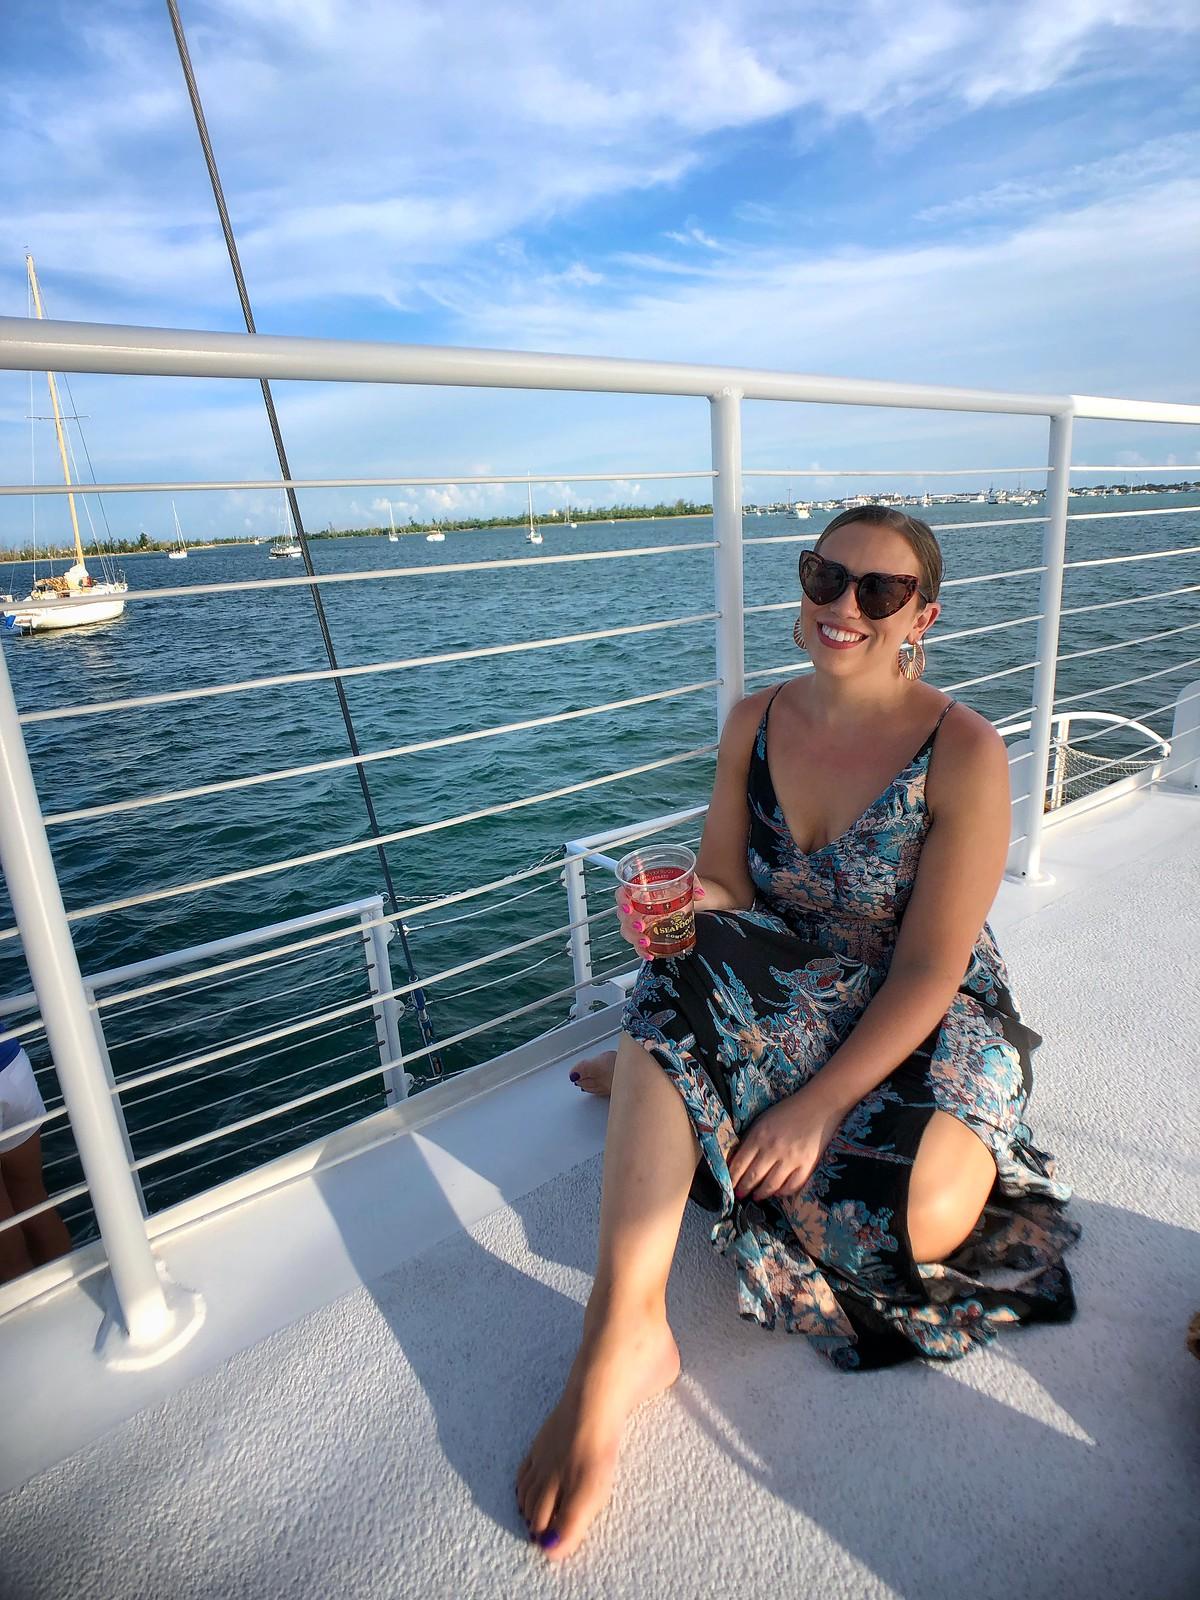 fury-sunset-cruise-ultimate-road-trip-5-days-florida-keys-itinerary-what-to-do-key-west-key-largo-islamorada-marathon-miami-vacation-guide